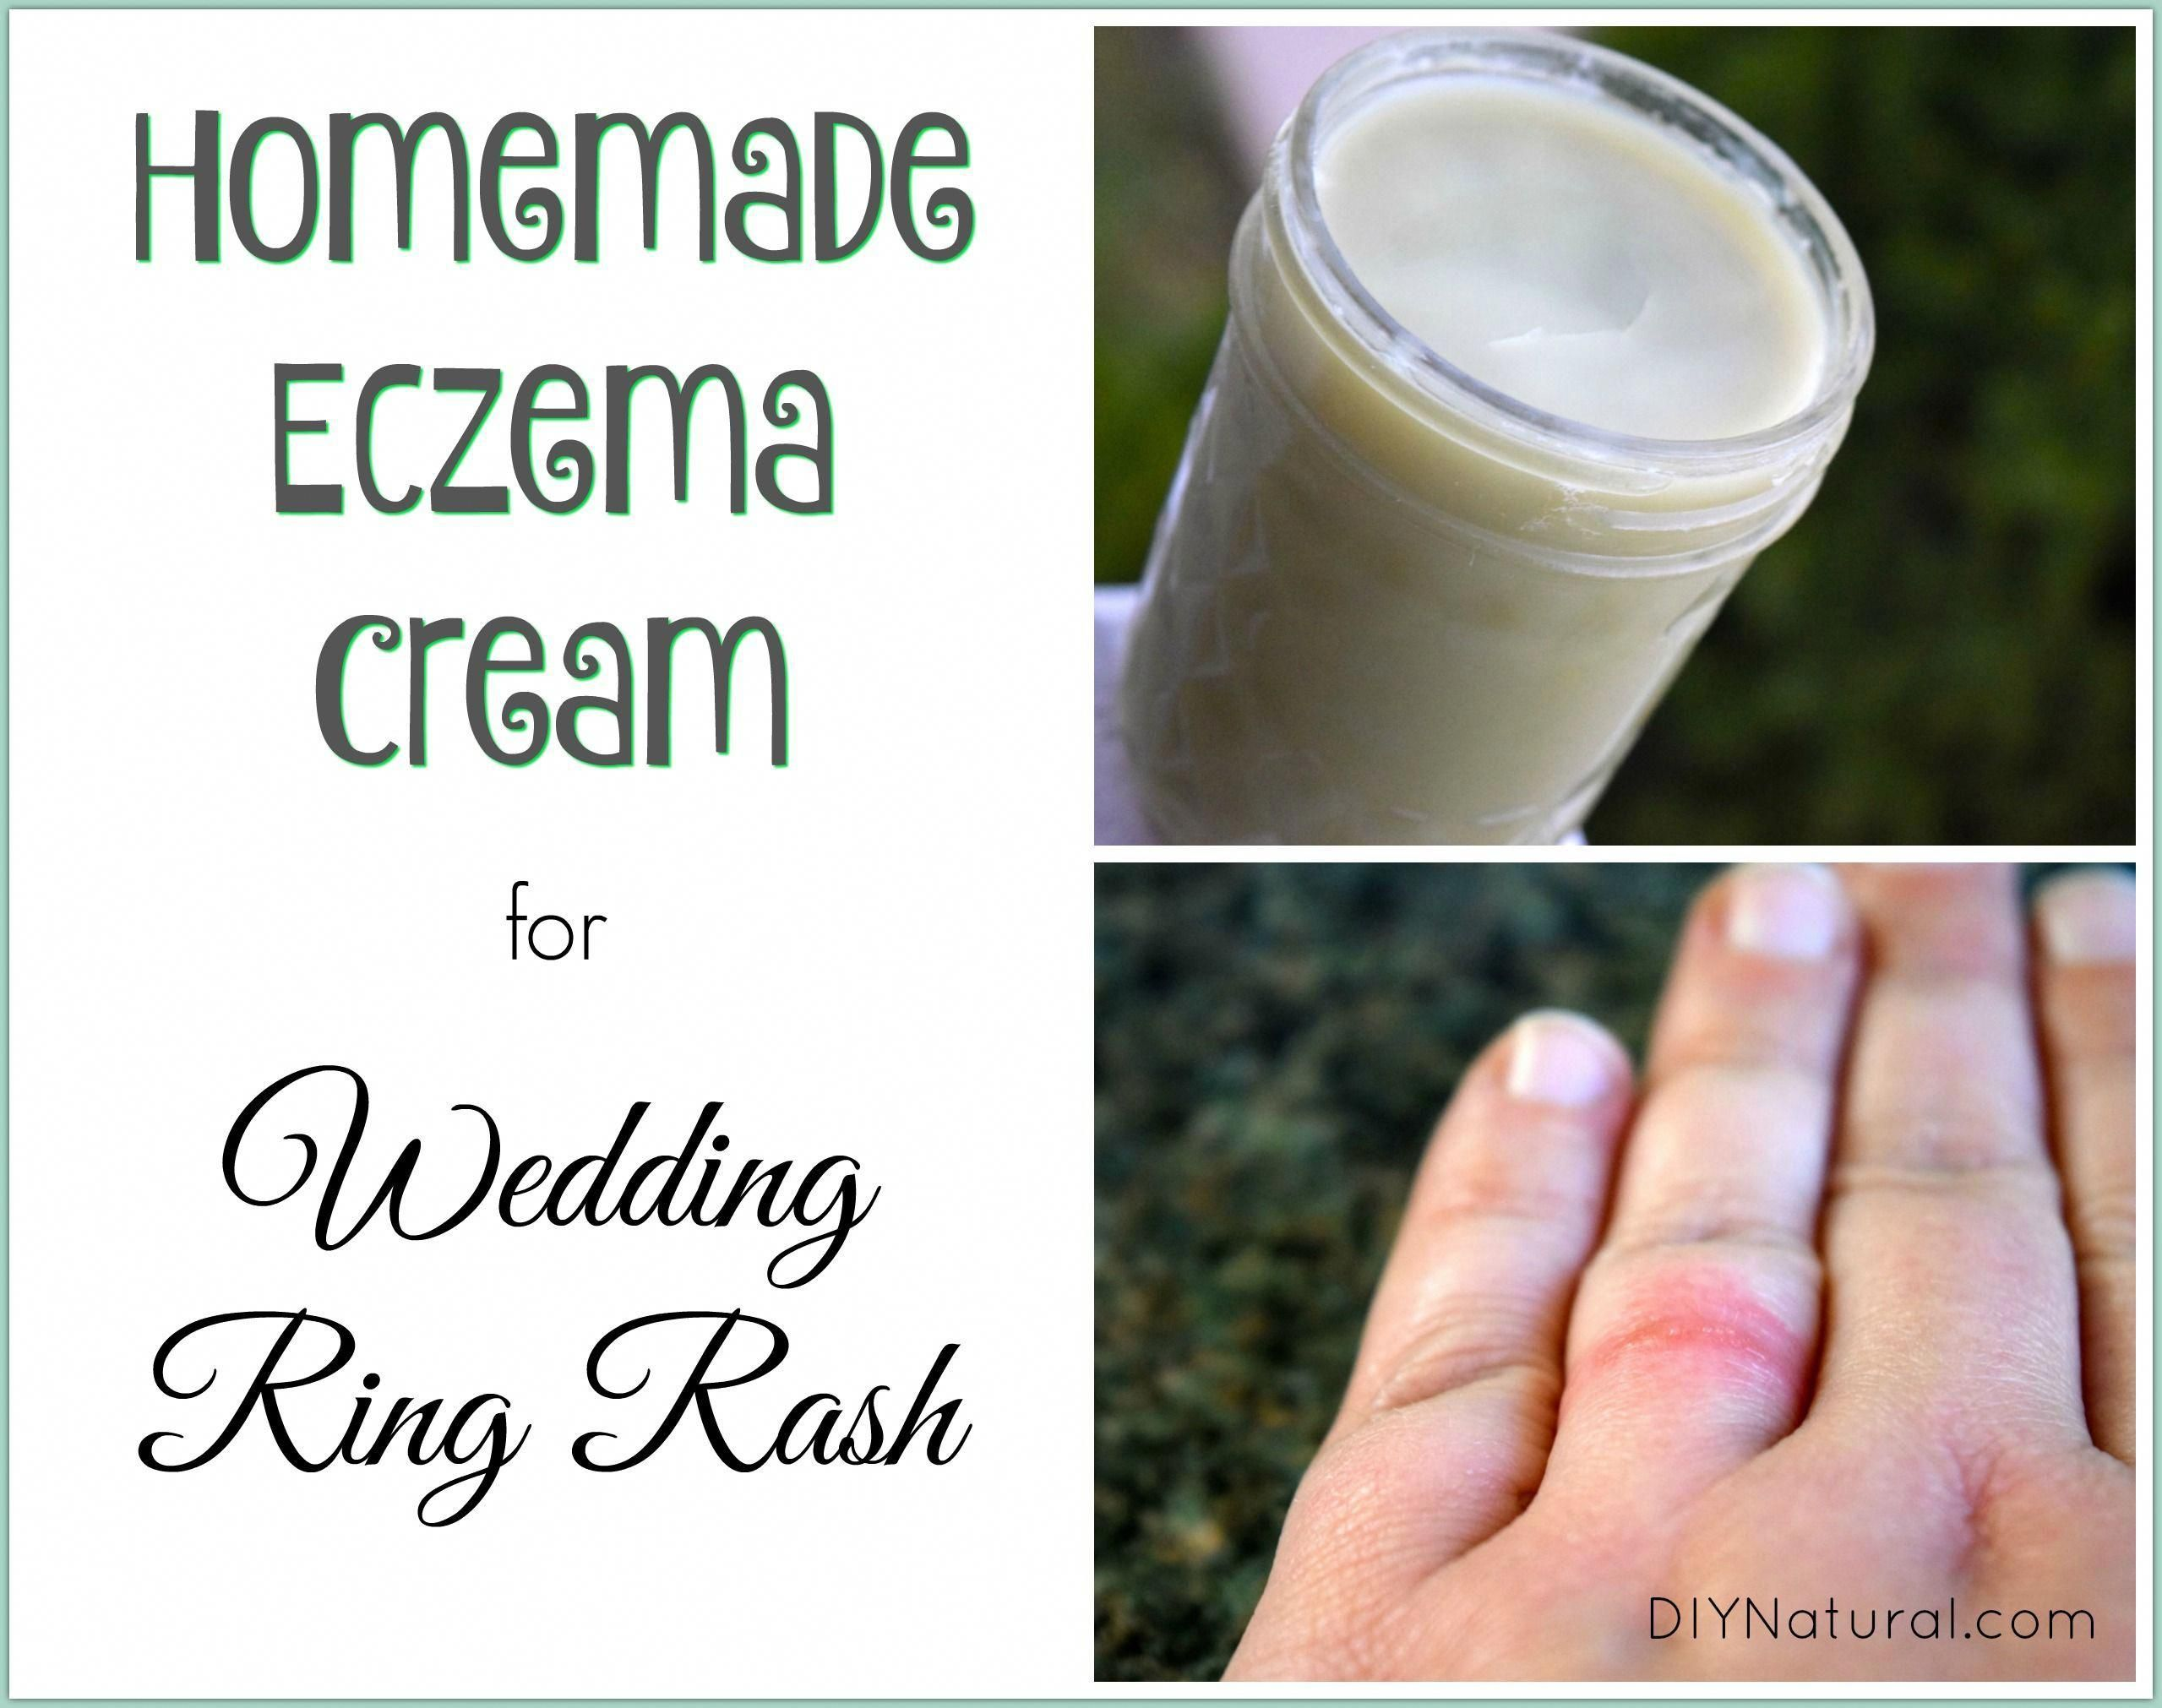 I made this homemade eczema cream to heal my wedding ring